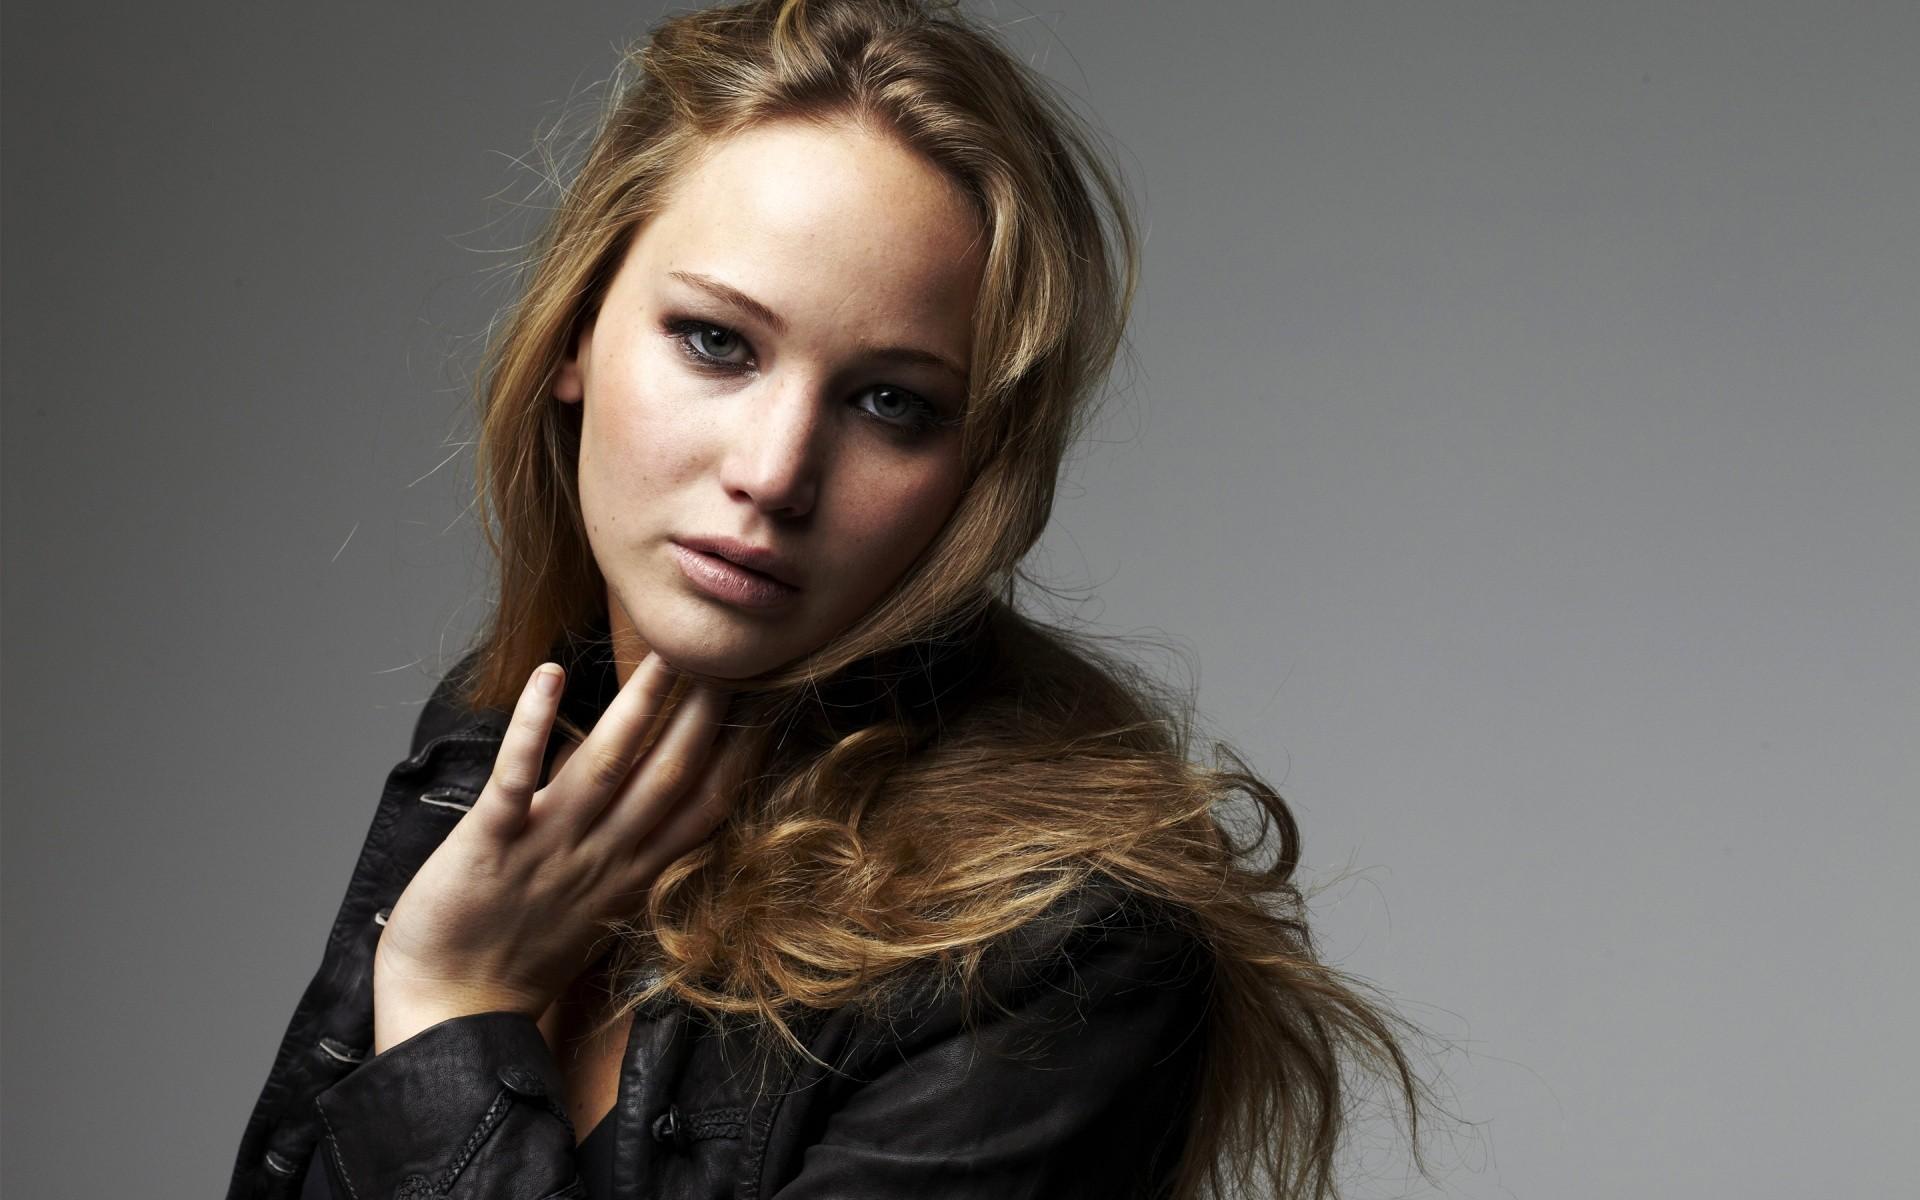 Free Jennifer Lawrence phone wallpaper by smush88